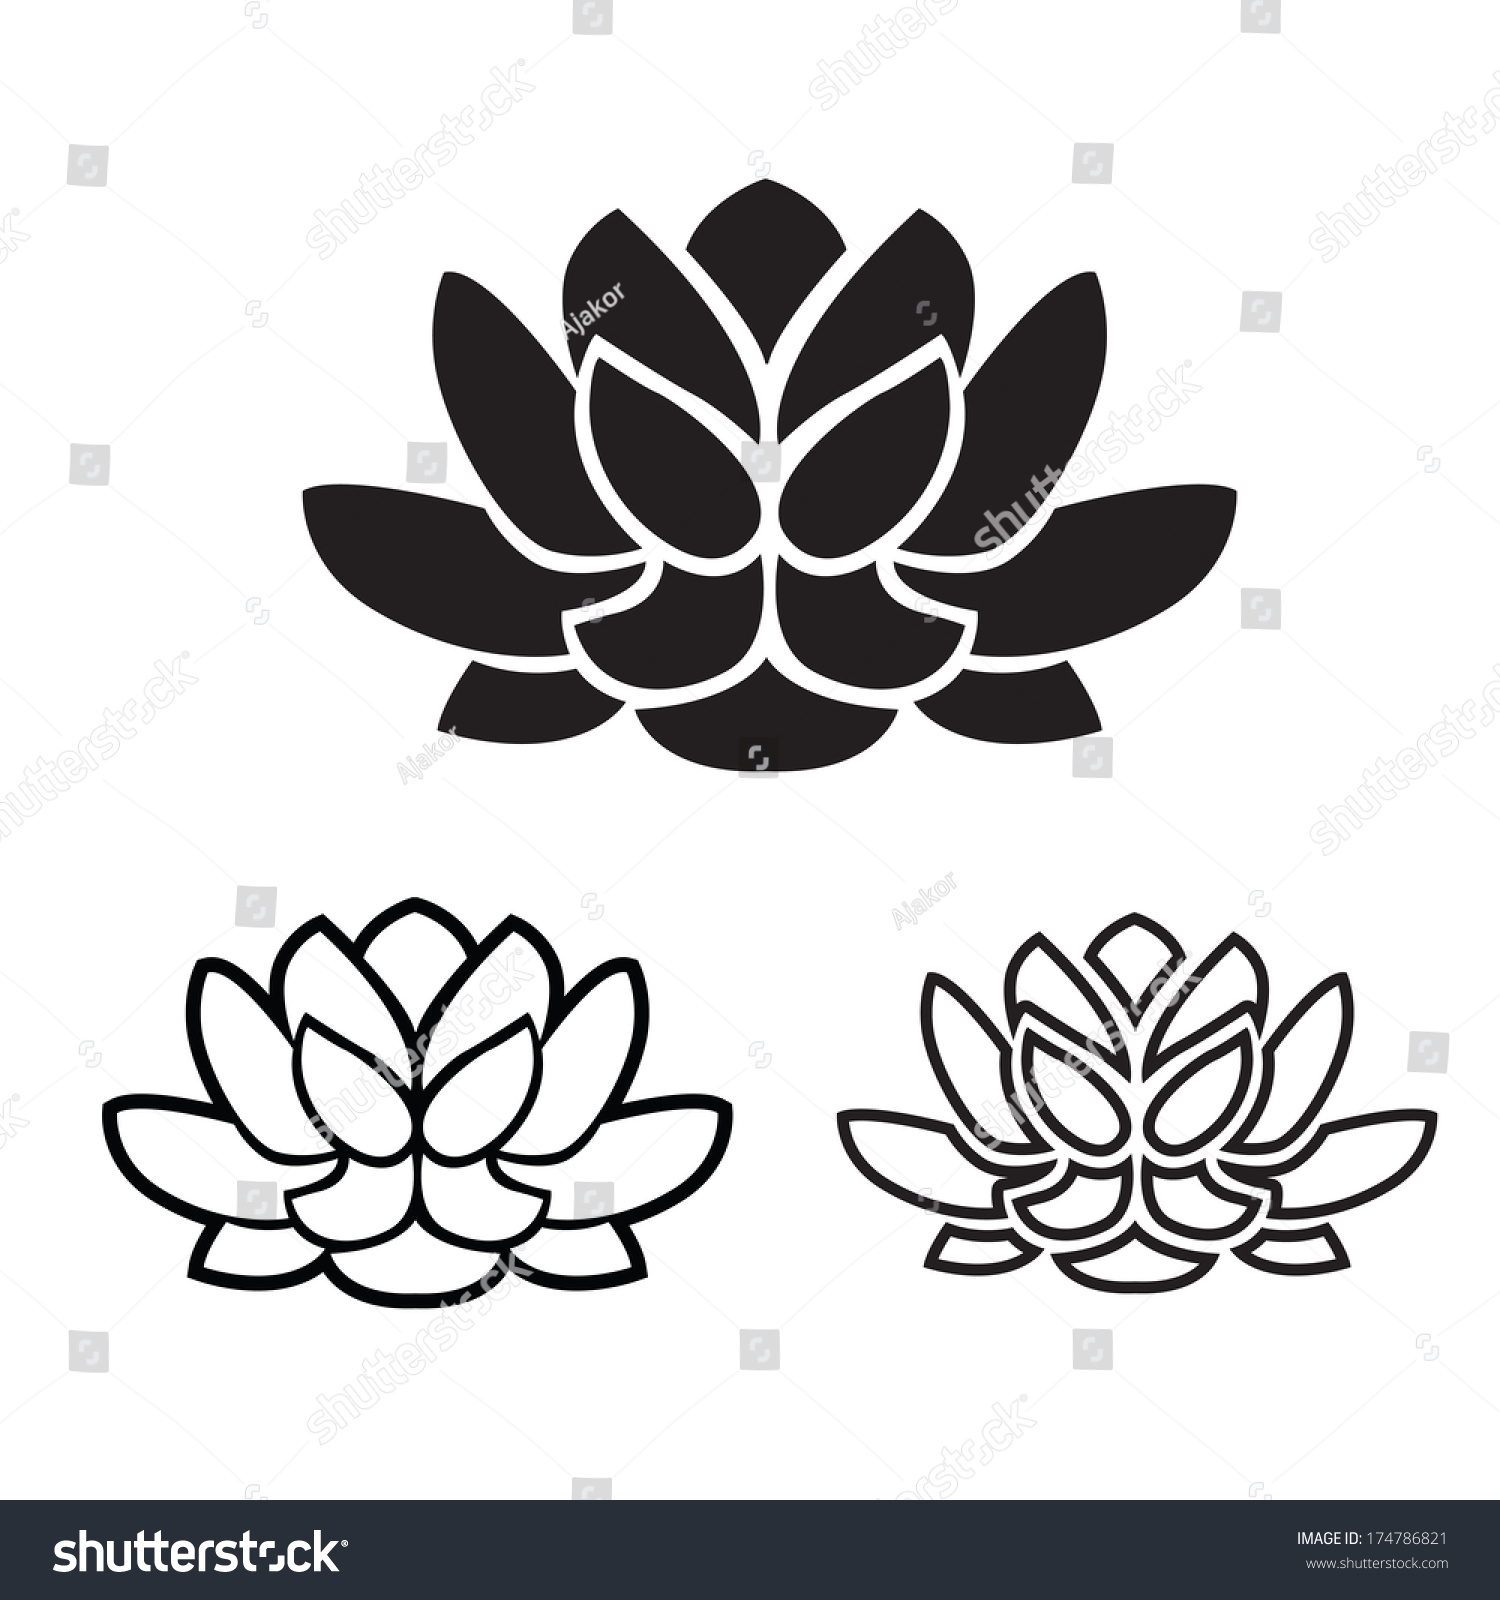 Symbol yoga lotus flower graphic vector stock vector 174786821 the symbol of yoga lotus flower graphic vector illustration izmirmasajfo